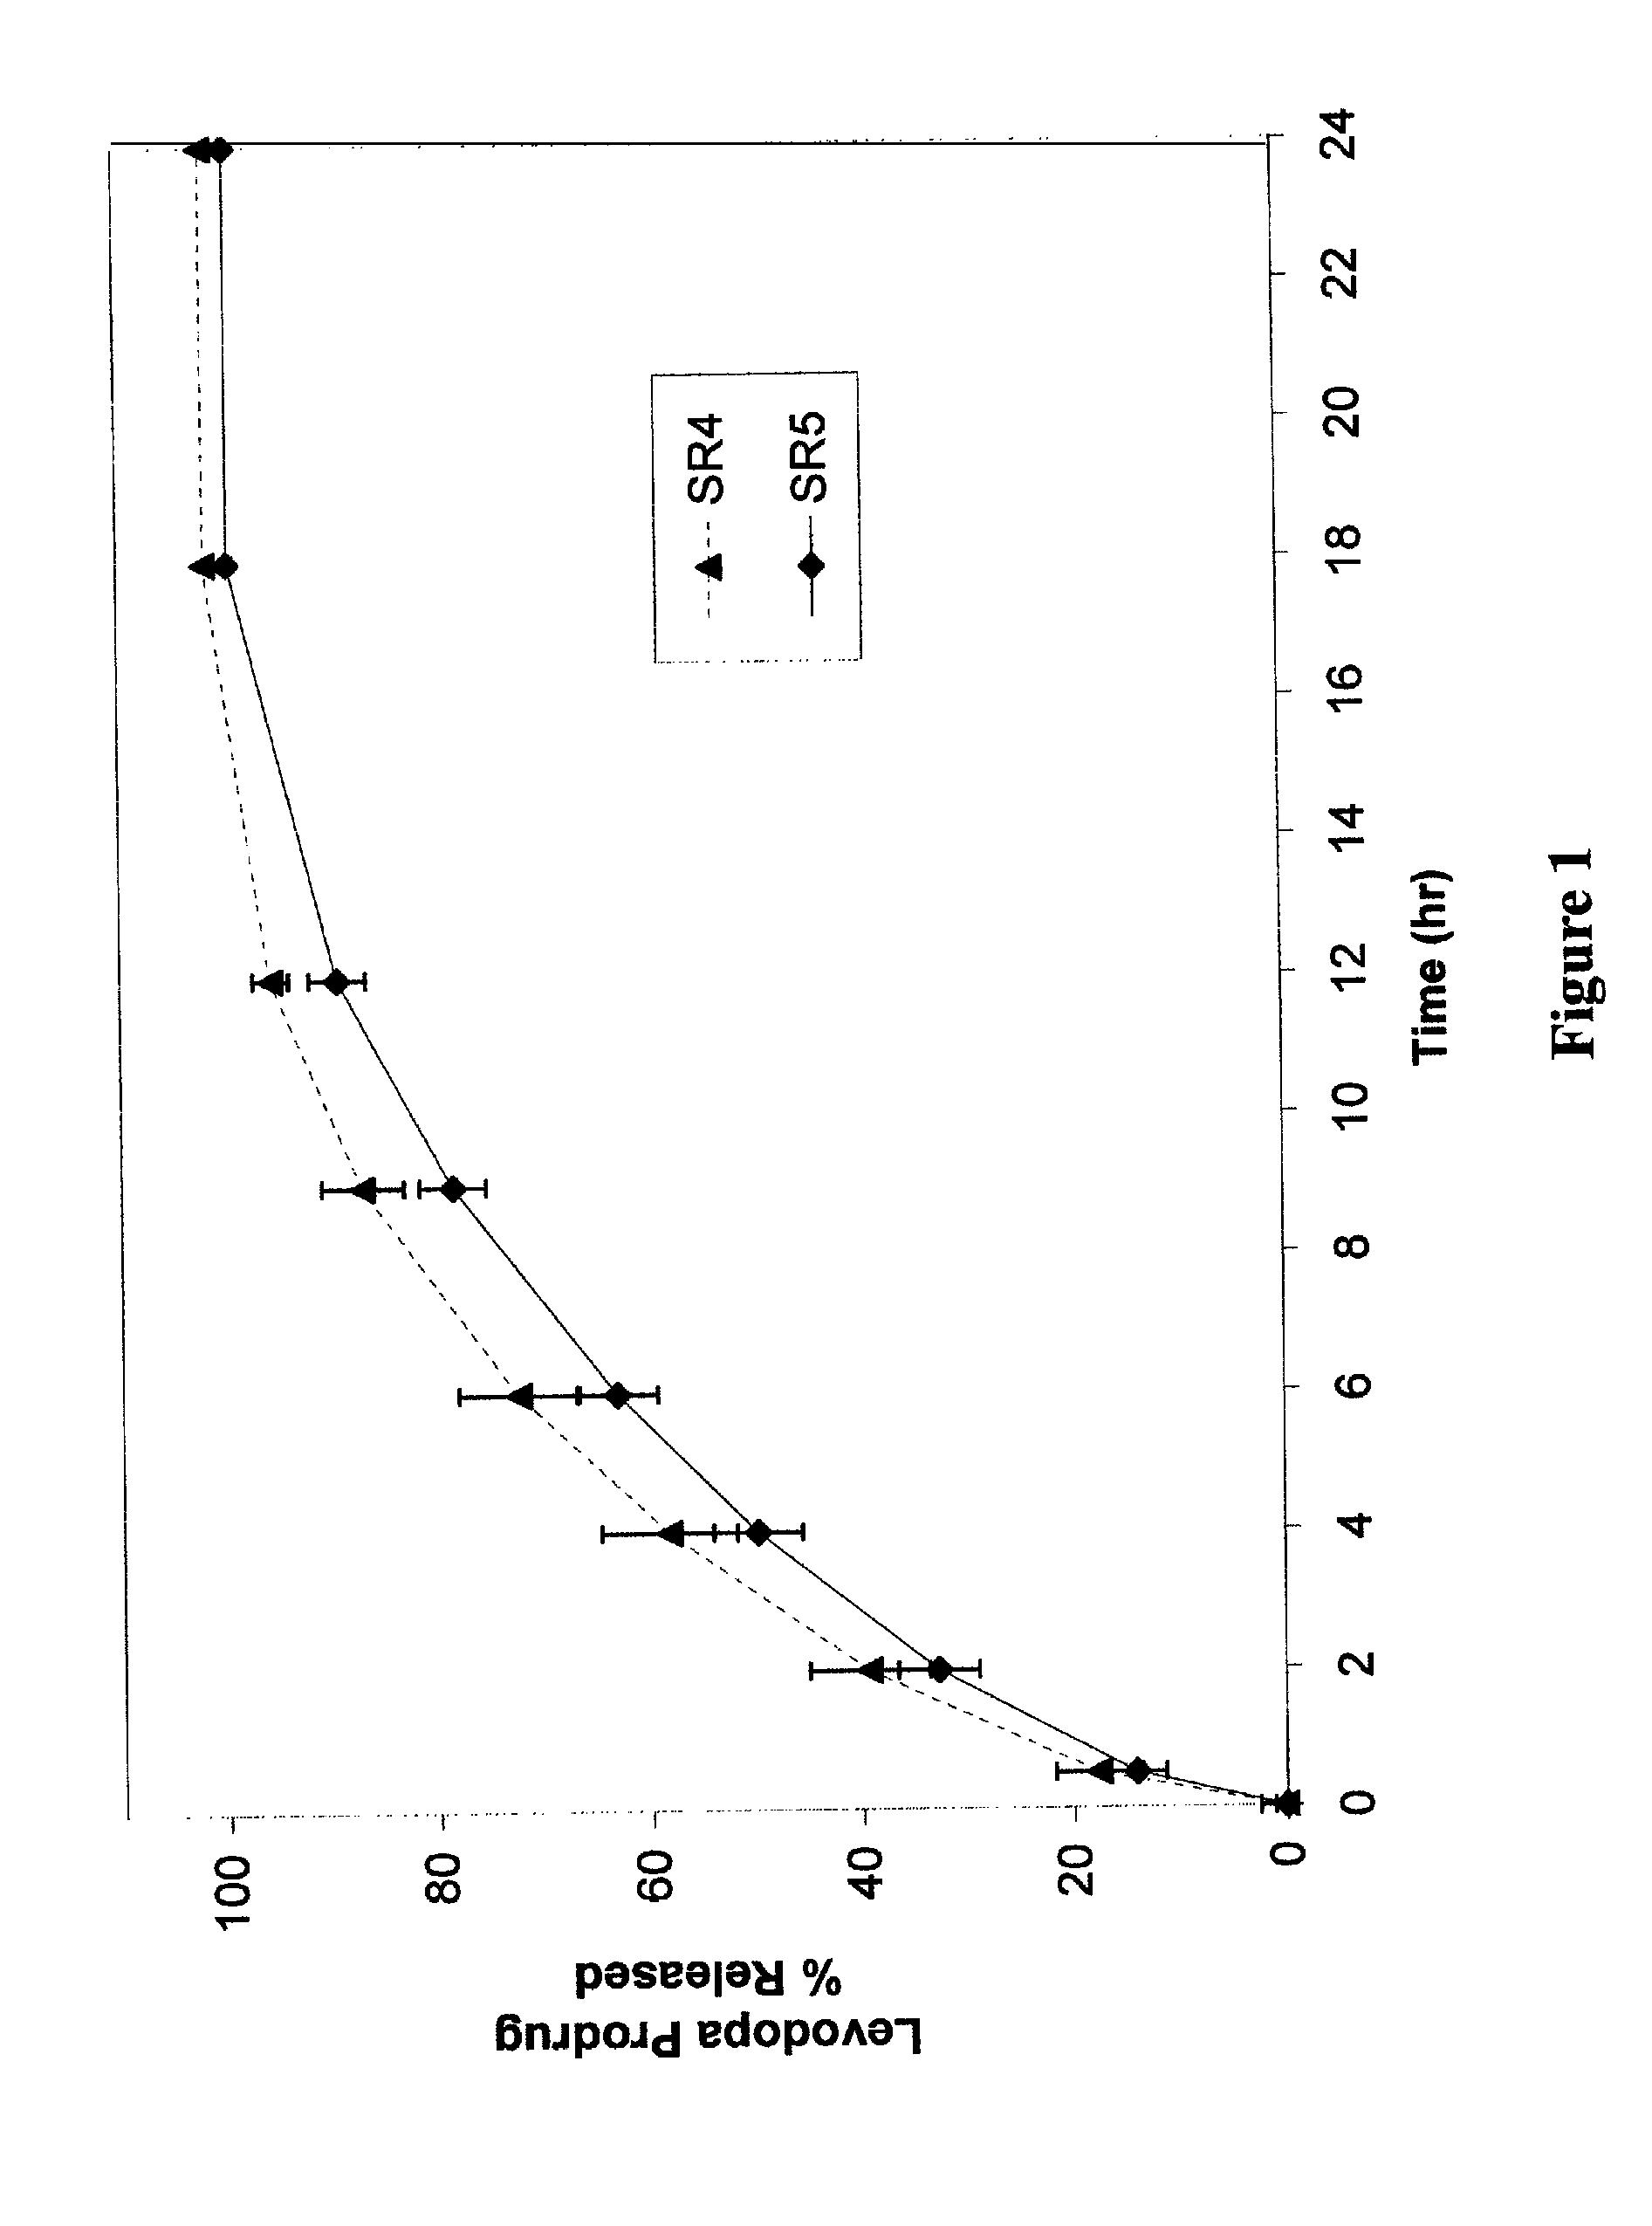 pregabalin dosage forms nitroglycerin